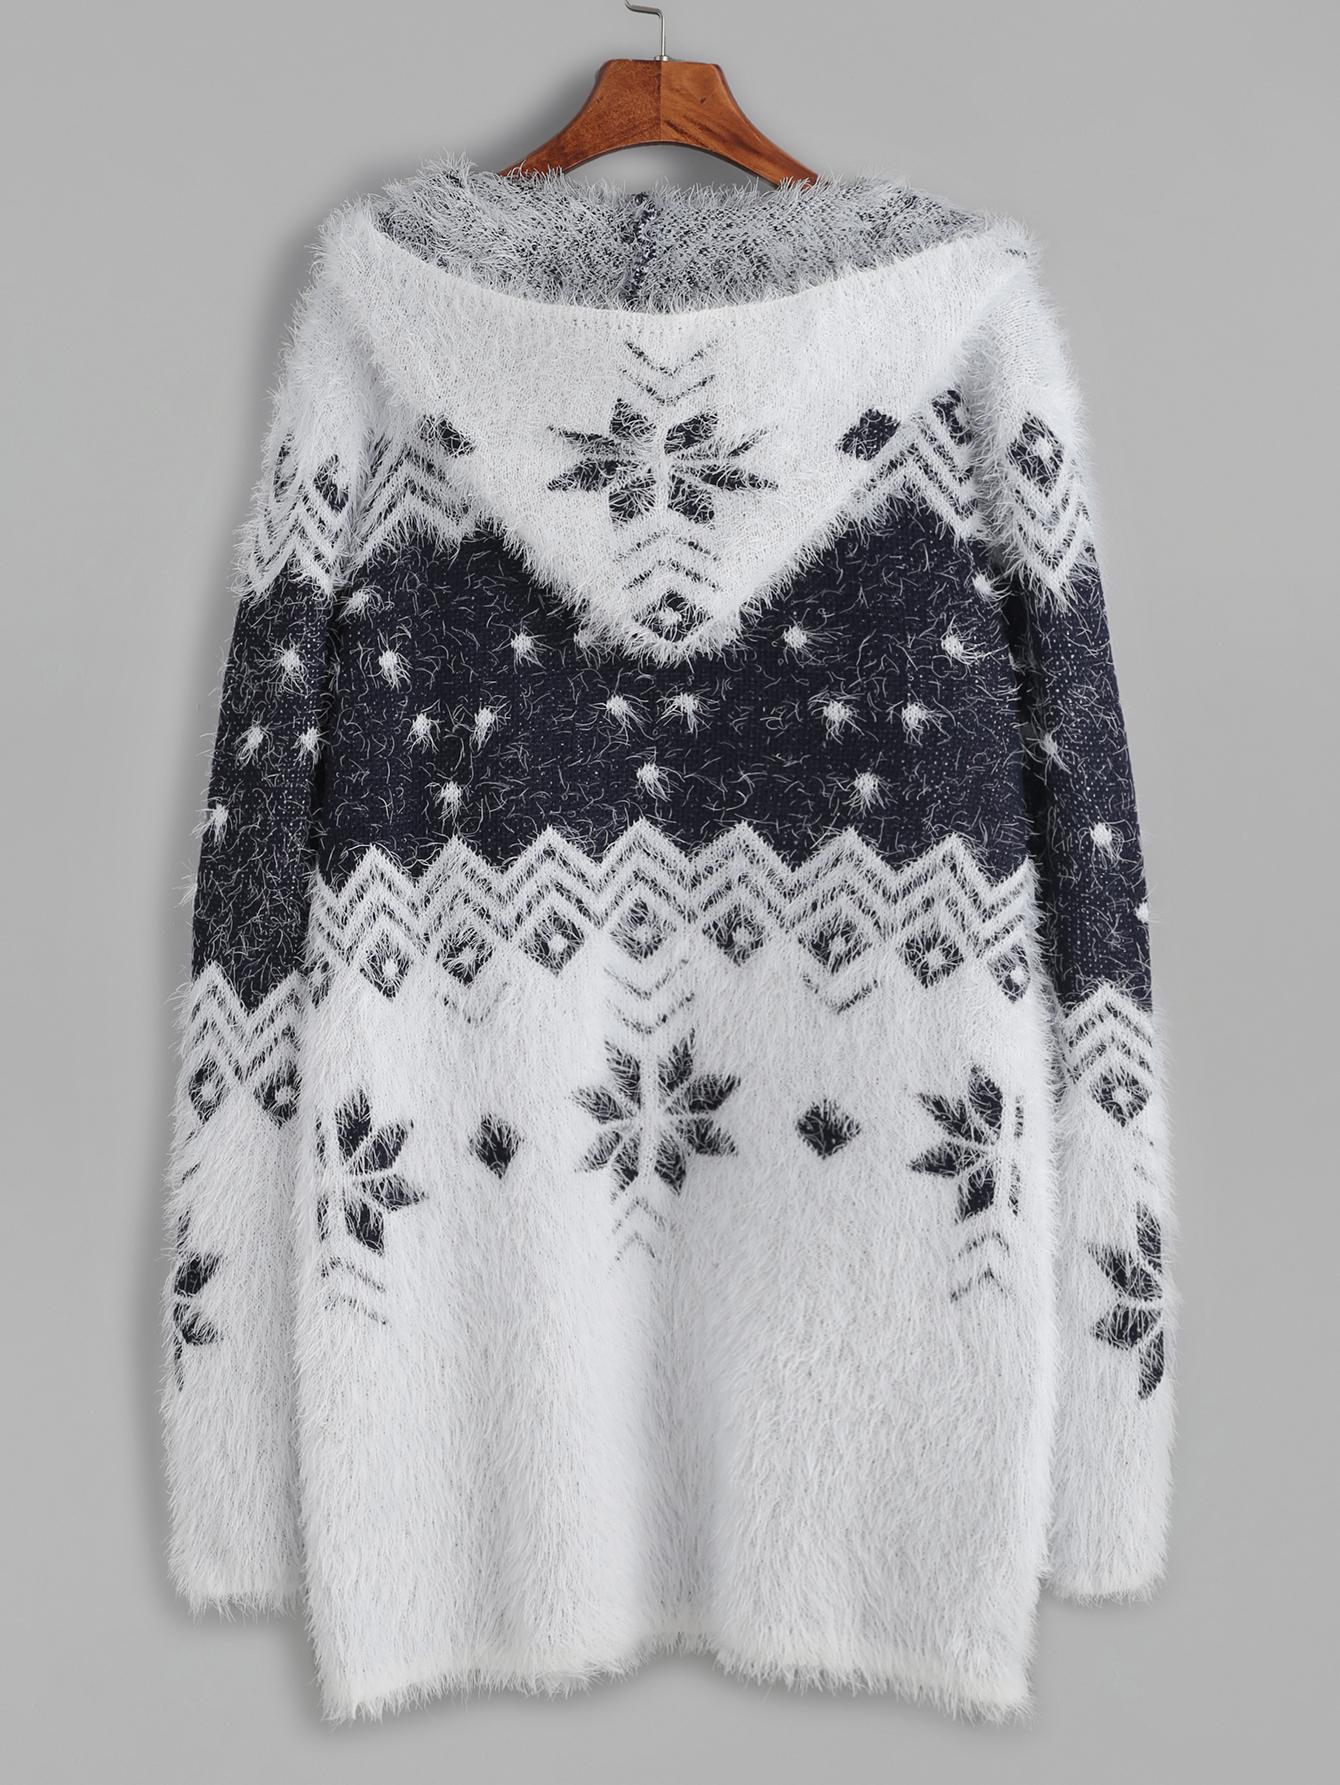 50dbdee9a9e8 ... Color Block Snowflake Pattern Fuzzy Hooded Sweater Coat Cardigan -  Thumbnail 3